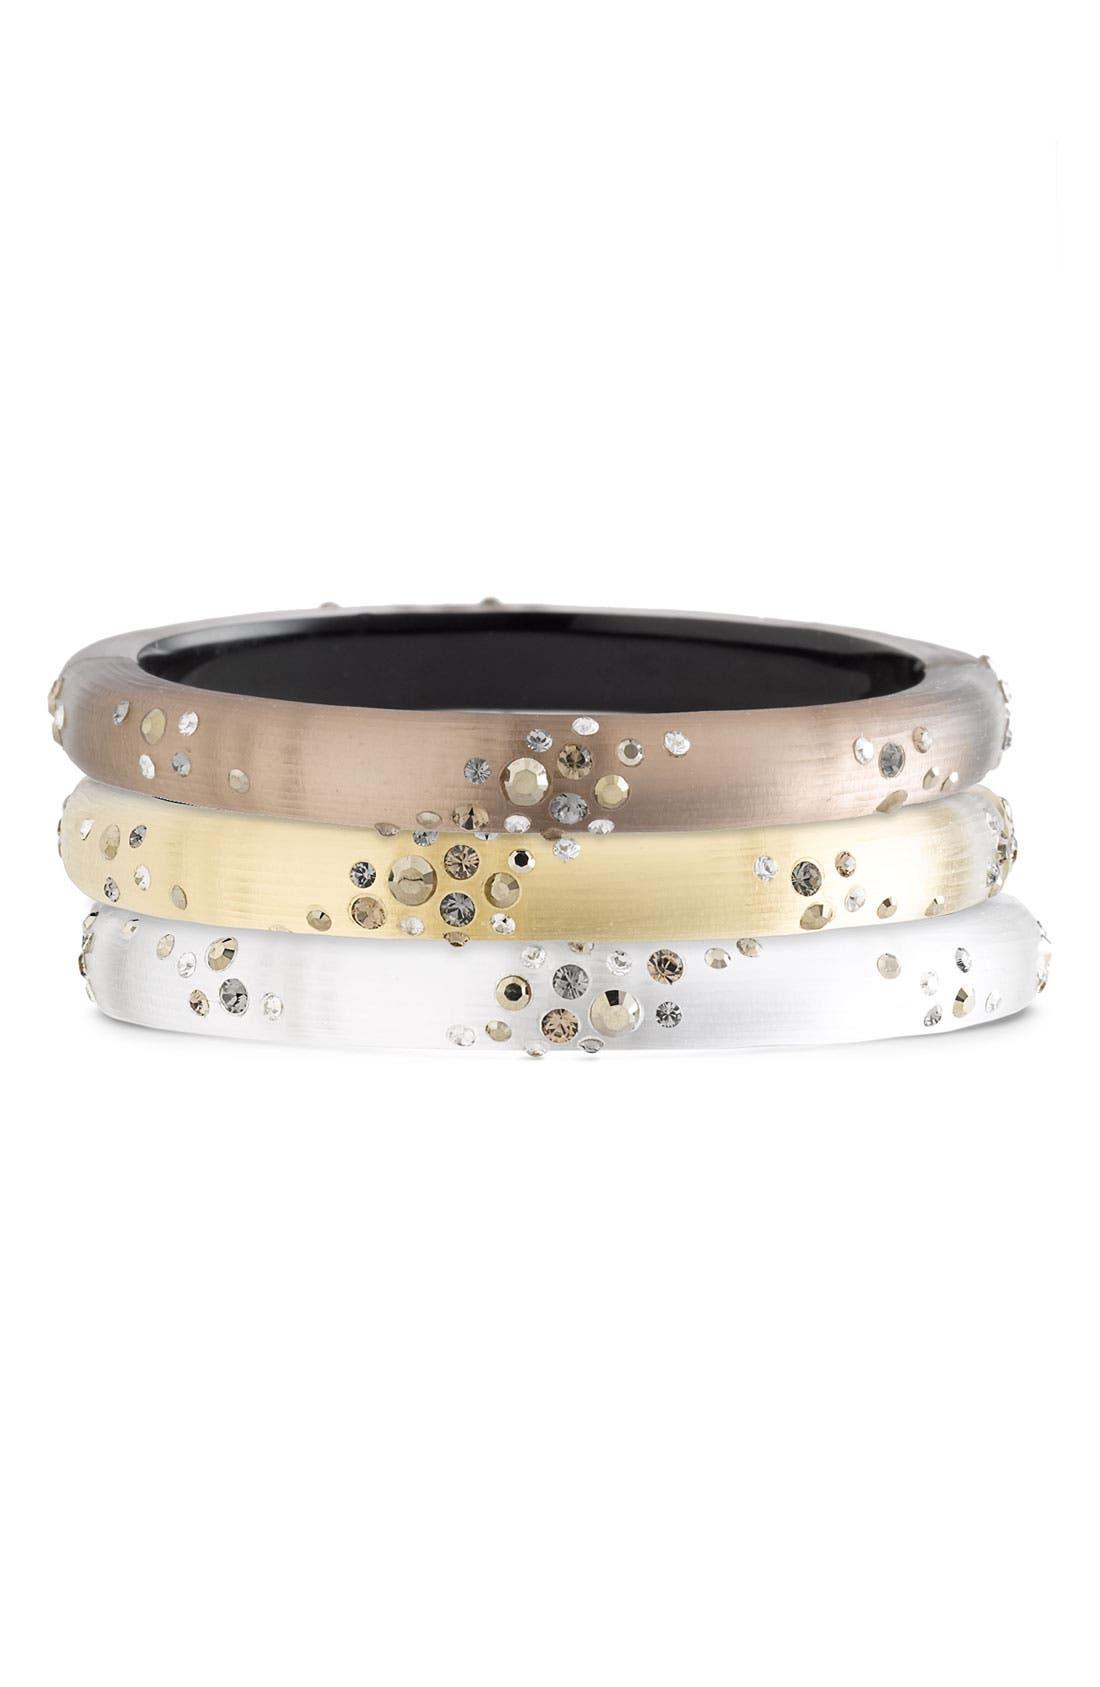 ALEXIS BITTAR 'Smoky Dust' Small Hinged Bracelet, Main, color, 040